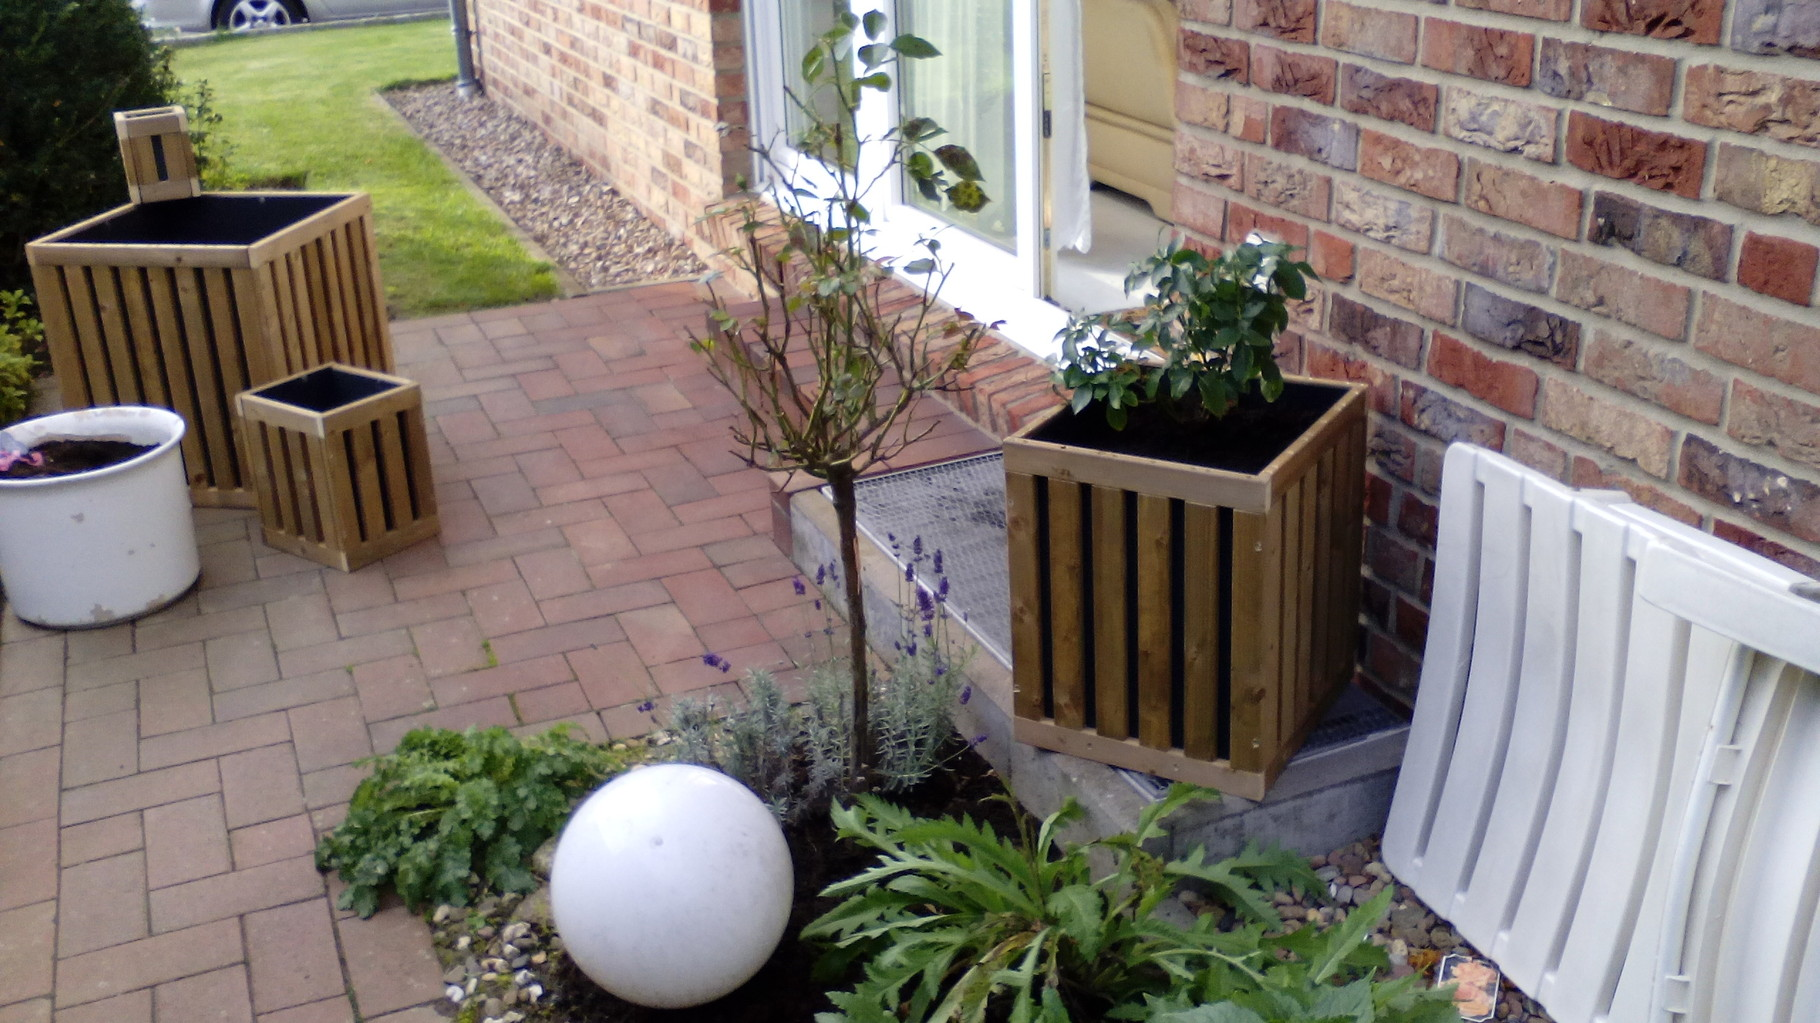 HoPstiBo PflanzKübel Prototyp mit Terrassenpflanzen